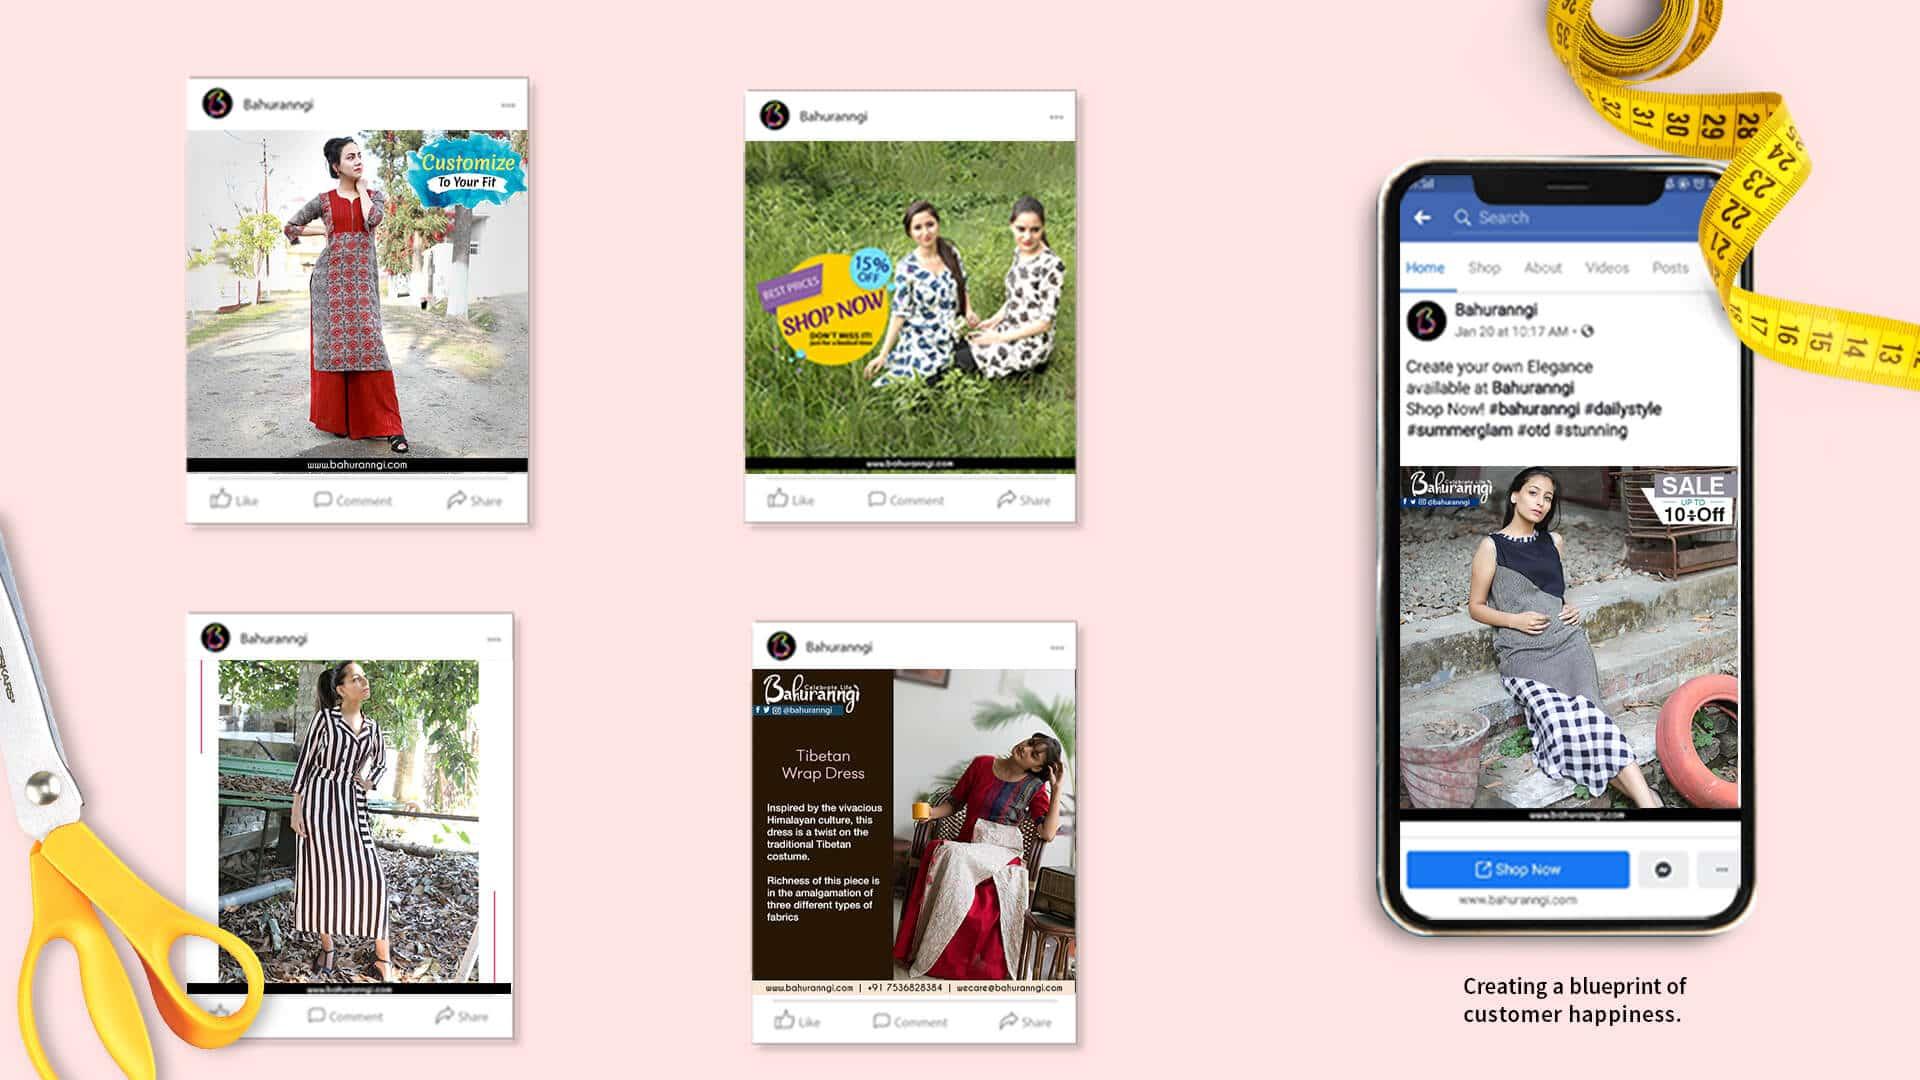 Benefits of socialmedia marketing